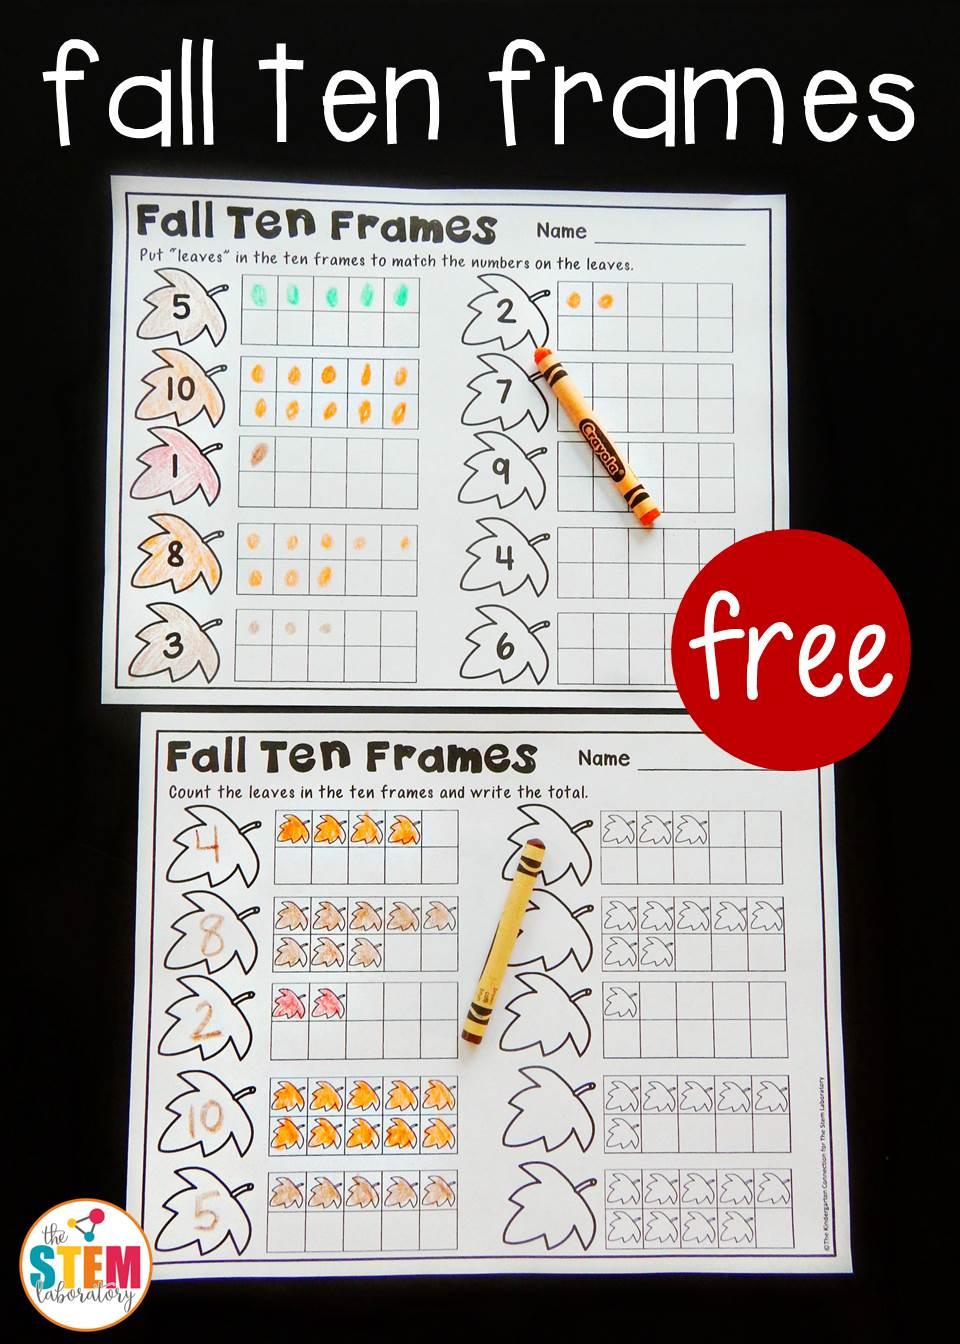 Fall Ten Frame Printables - The Stem Laboratory | Frame Games Printable Worksheets